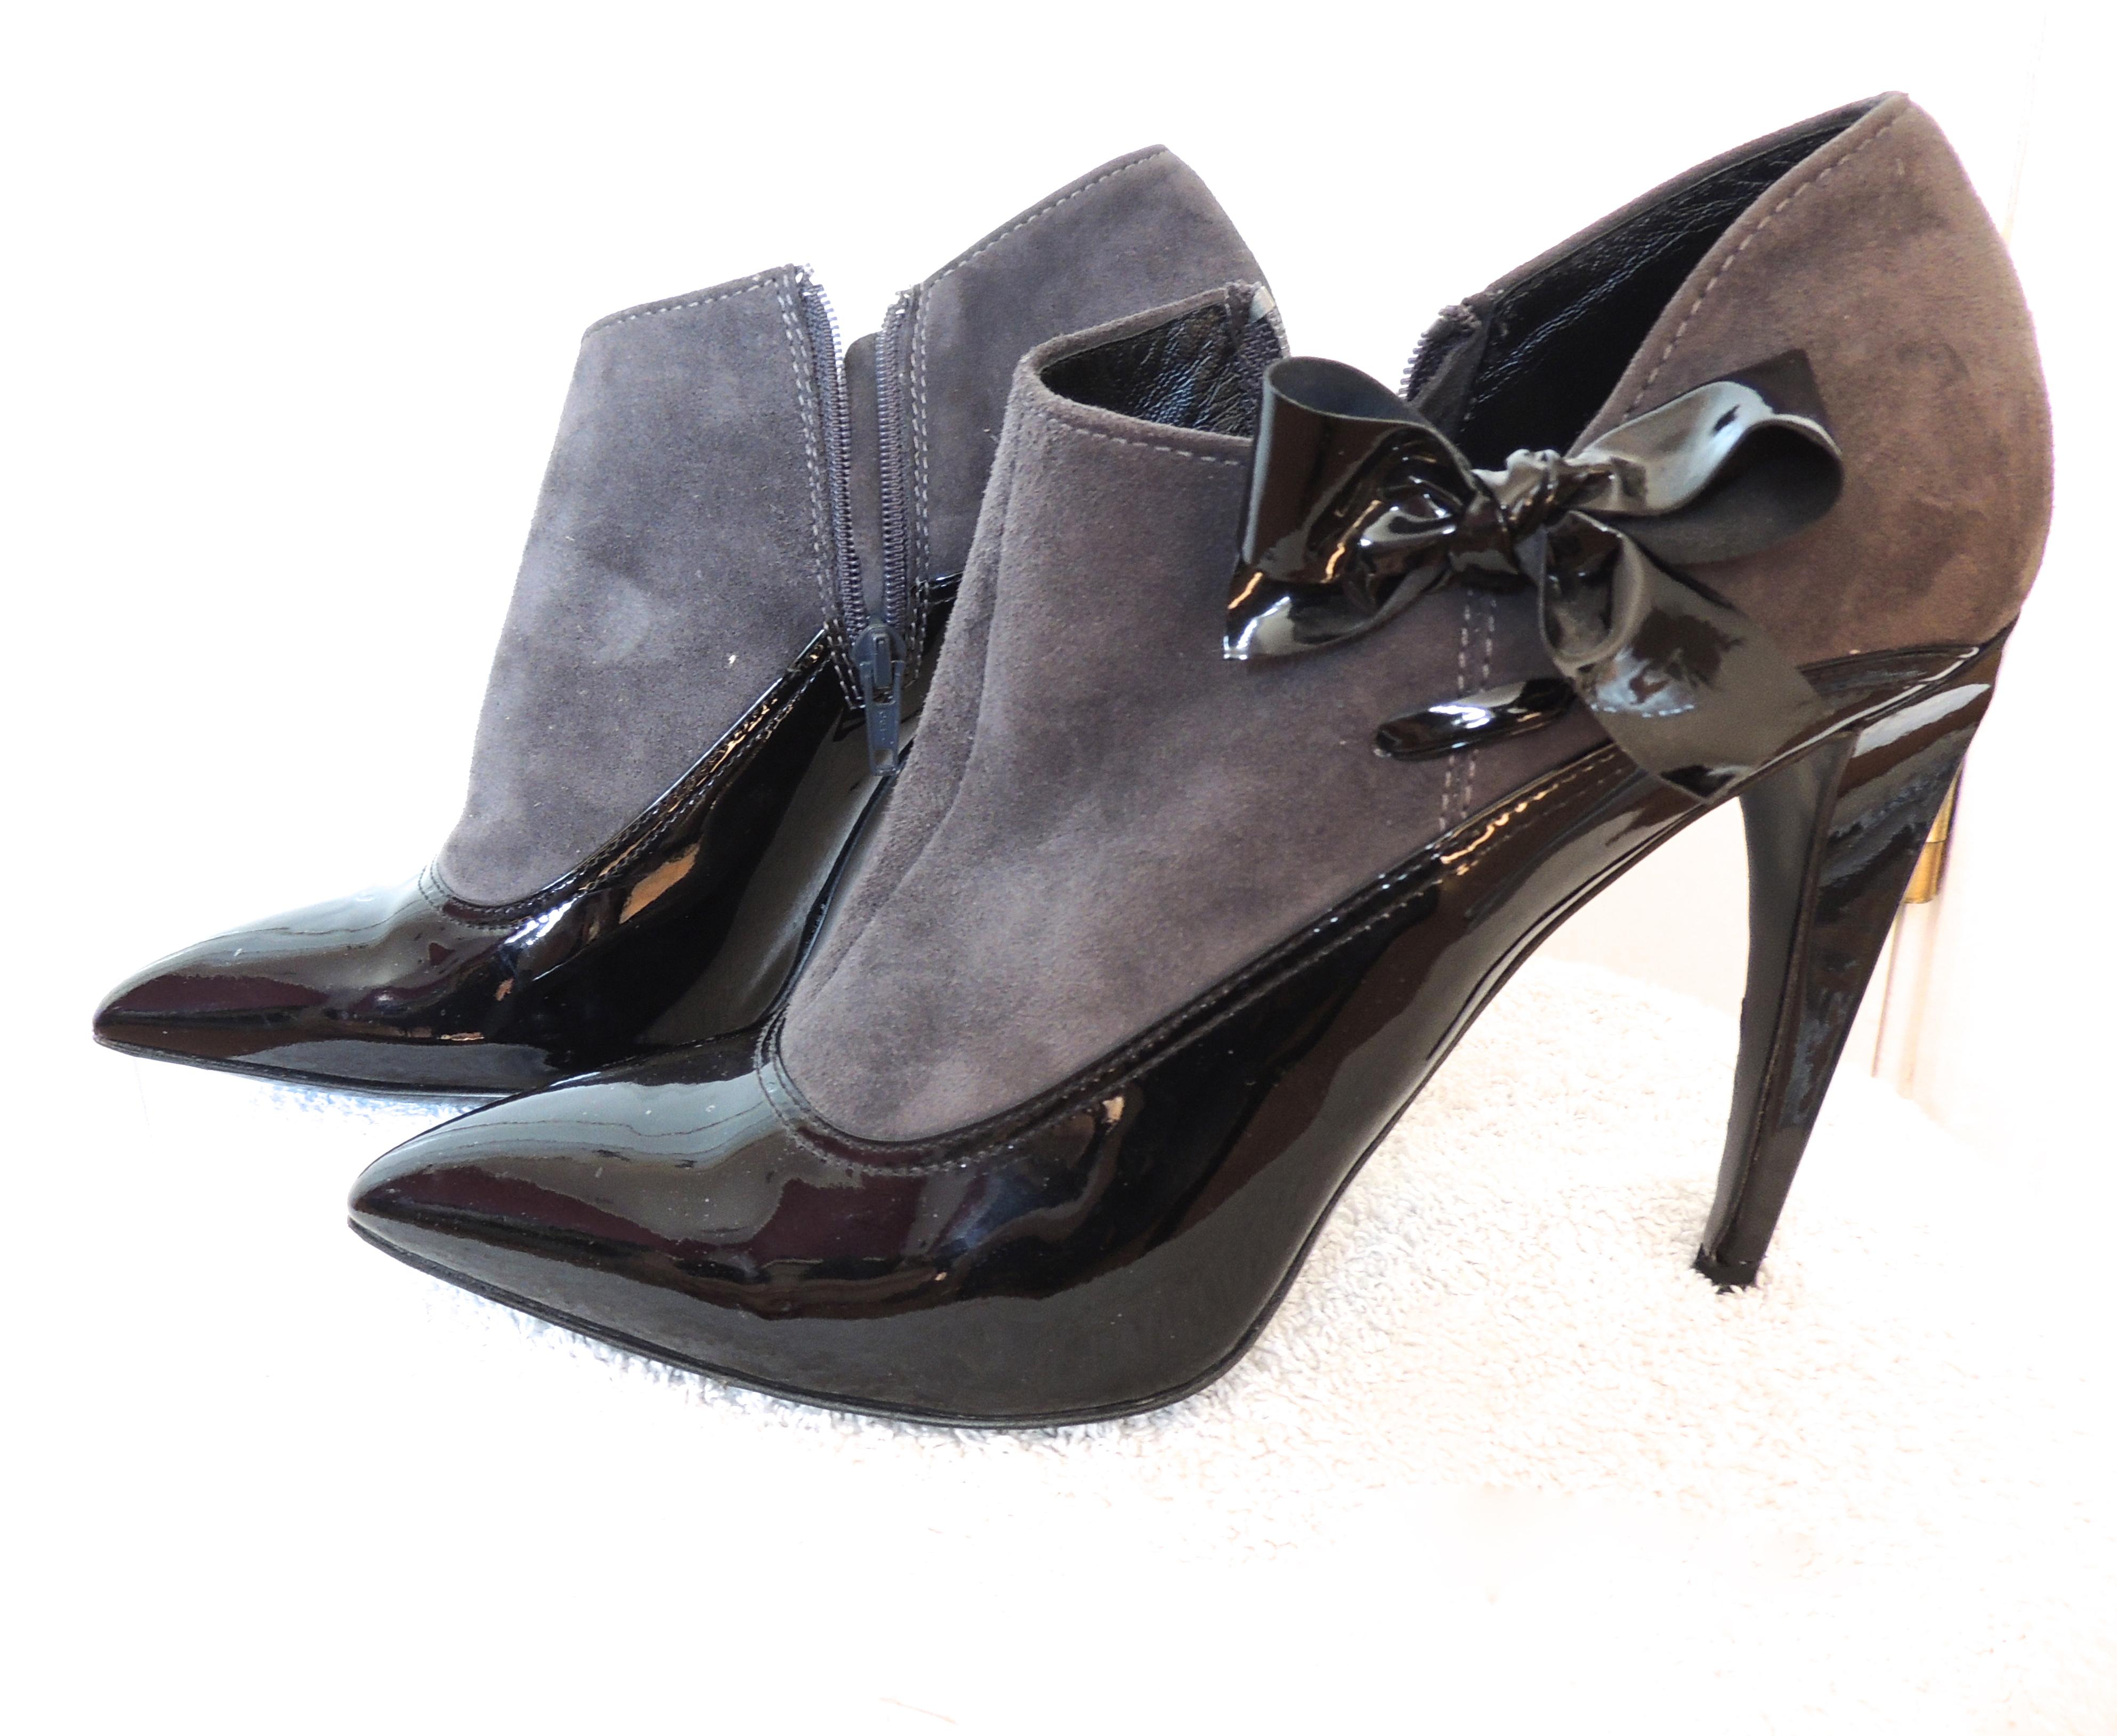 aeb21b228ad4 Mui Mui Banana Heel Shoe Boots